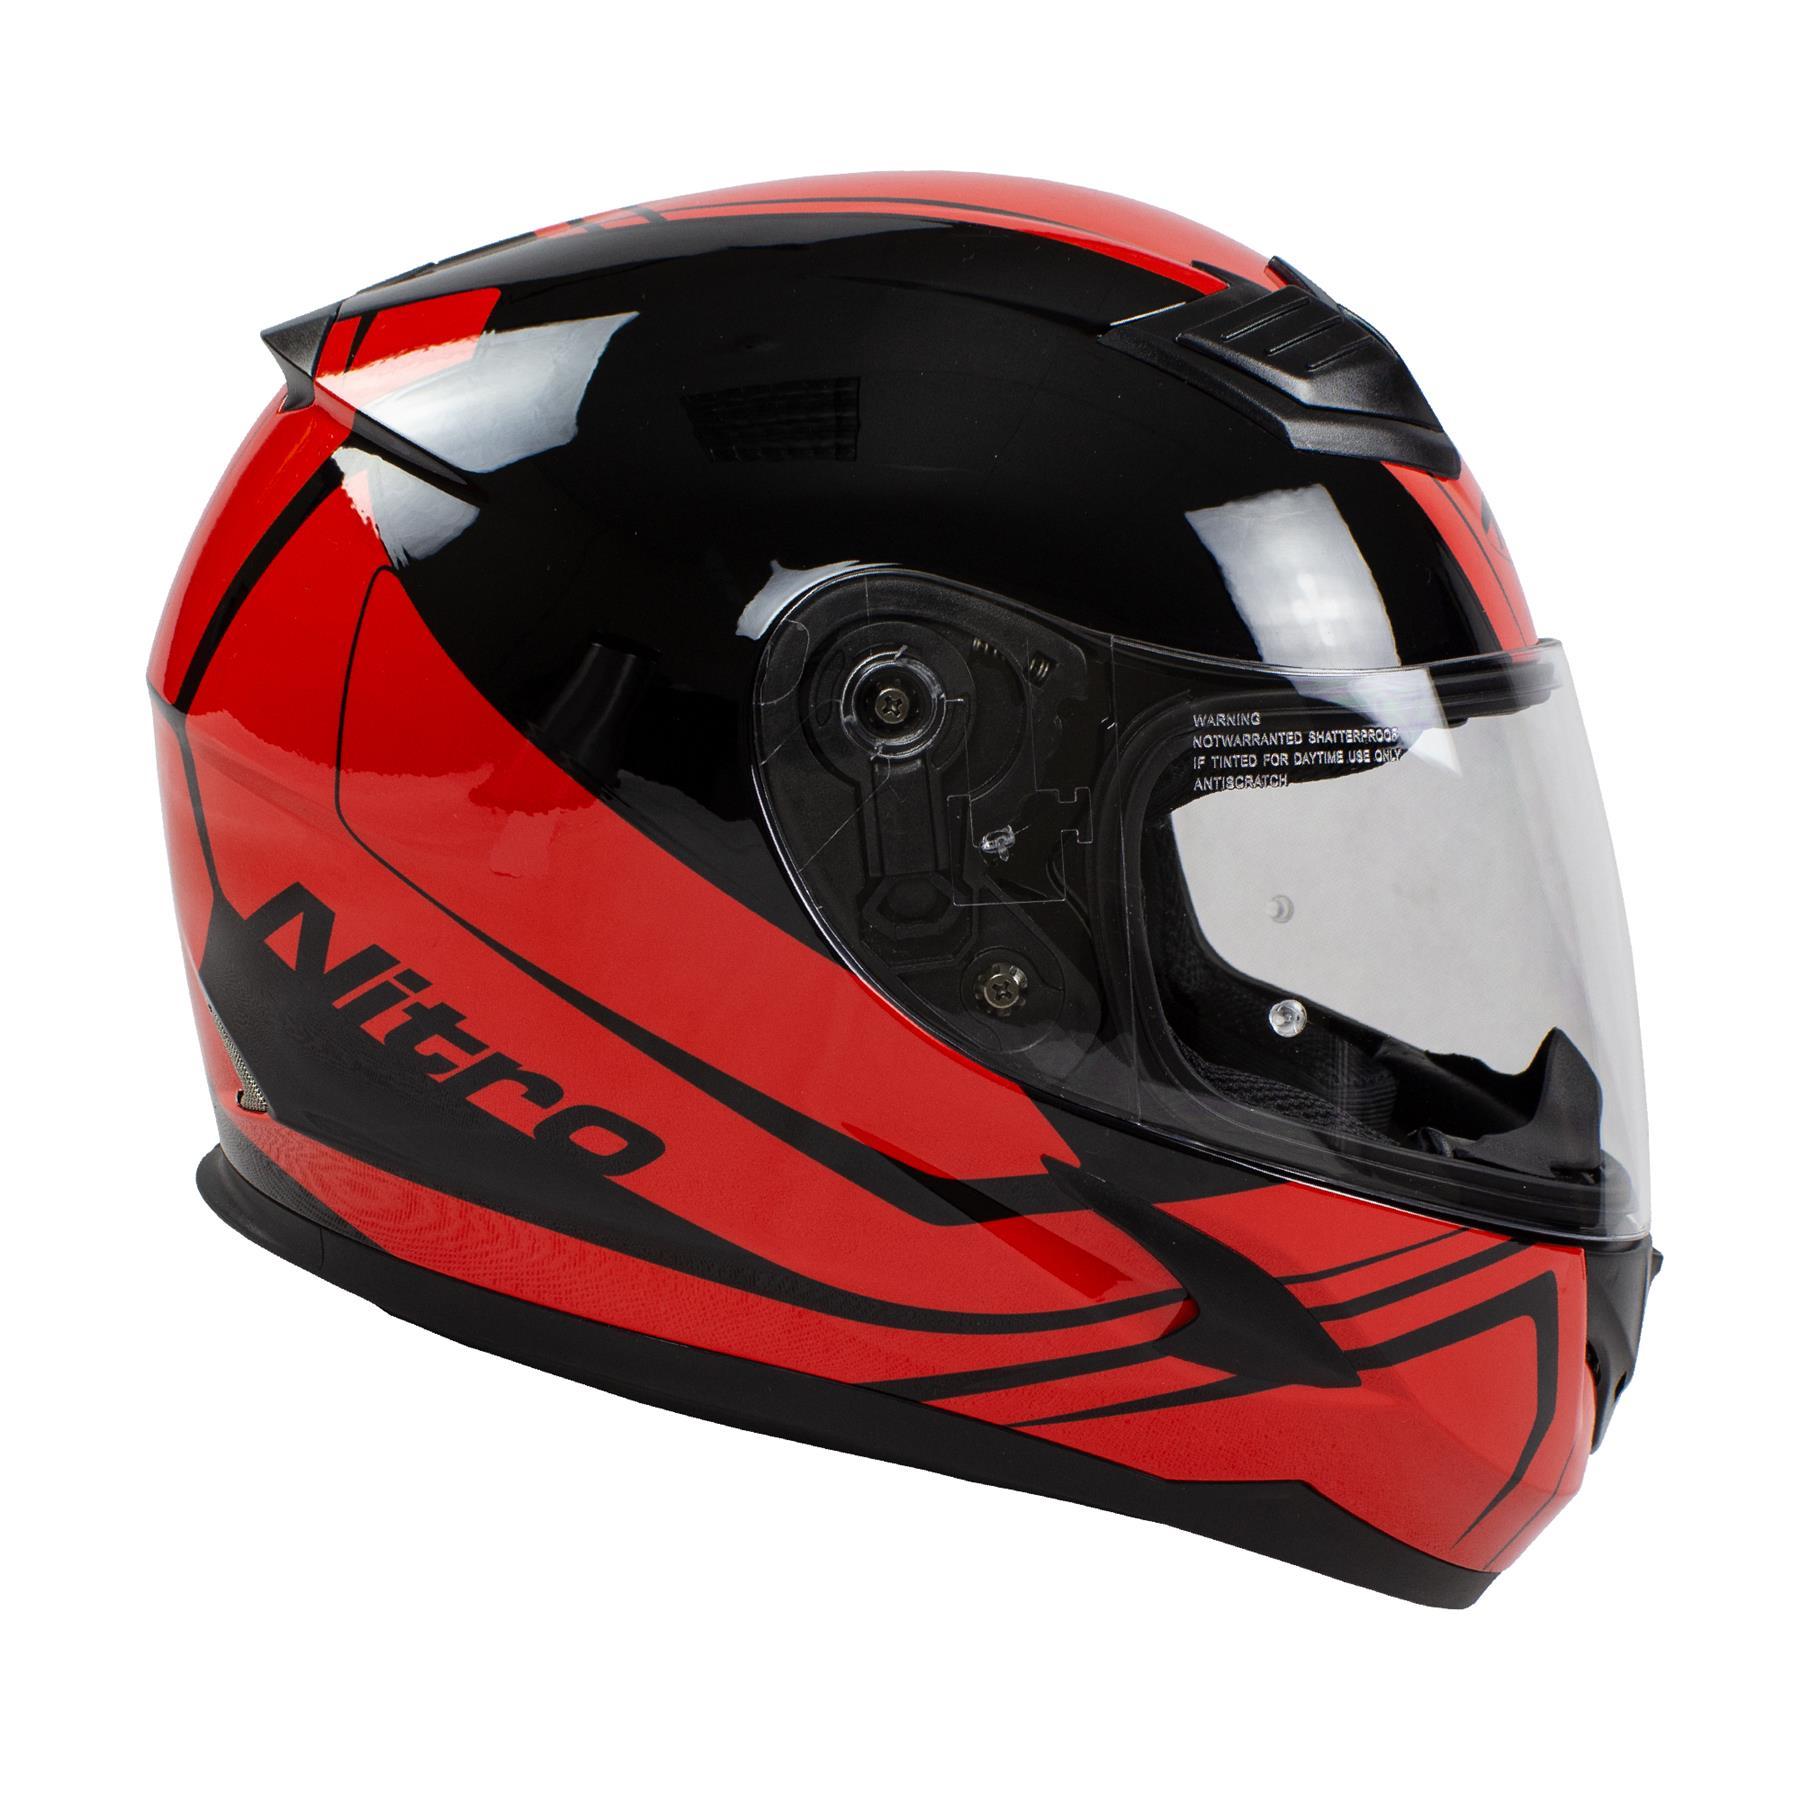 Nitro-N2400-Rogue-Full-Face-Motorcycle-Motorbike-Crash-Helmet-Black-Blue-Red thumbnail 25